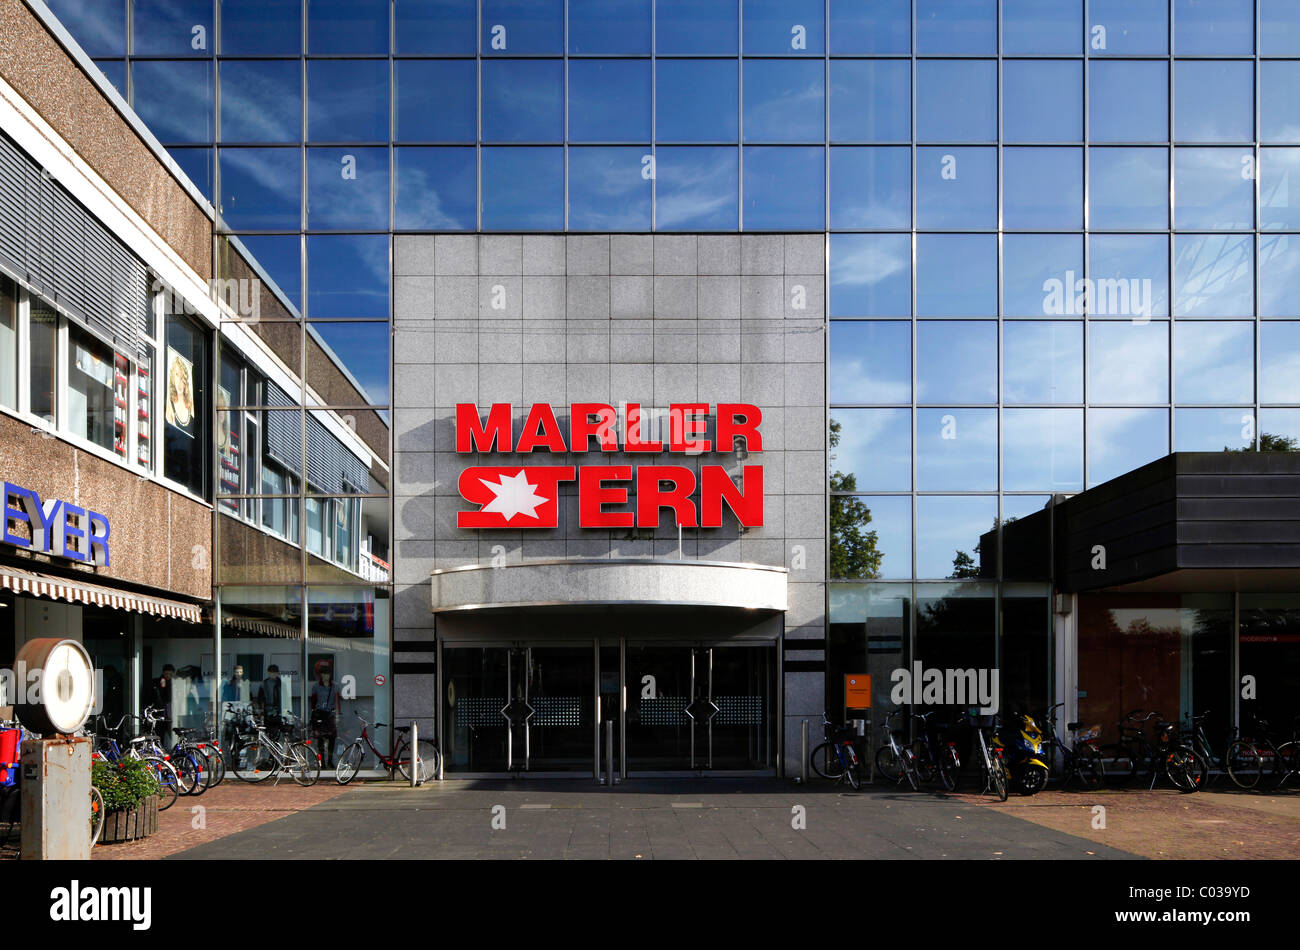 Marler Stern shopping centre, Marl, Ruhr Area, North Rhine-Westphalia, Germany, Europe - Stock Image